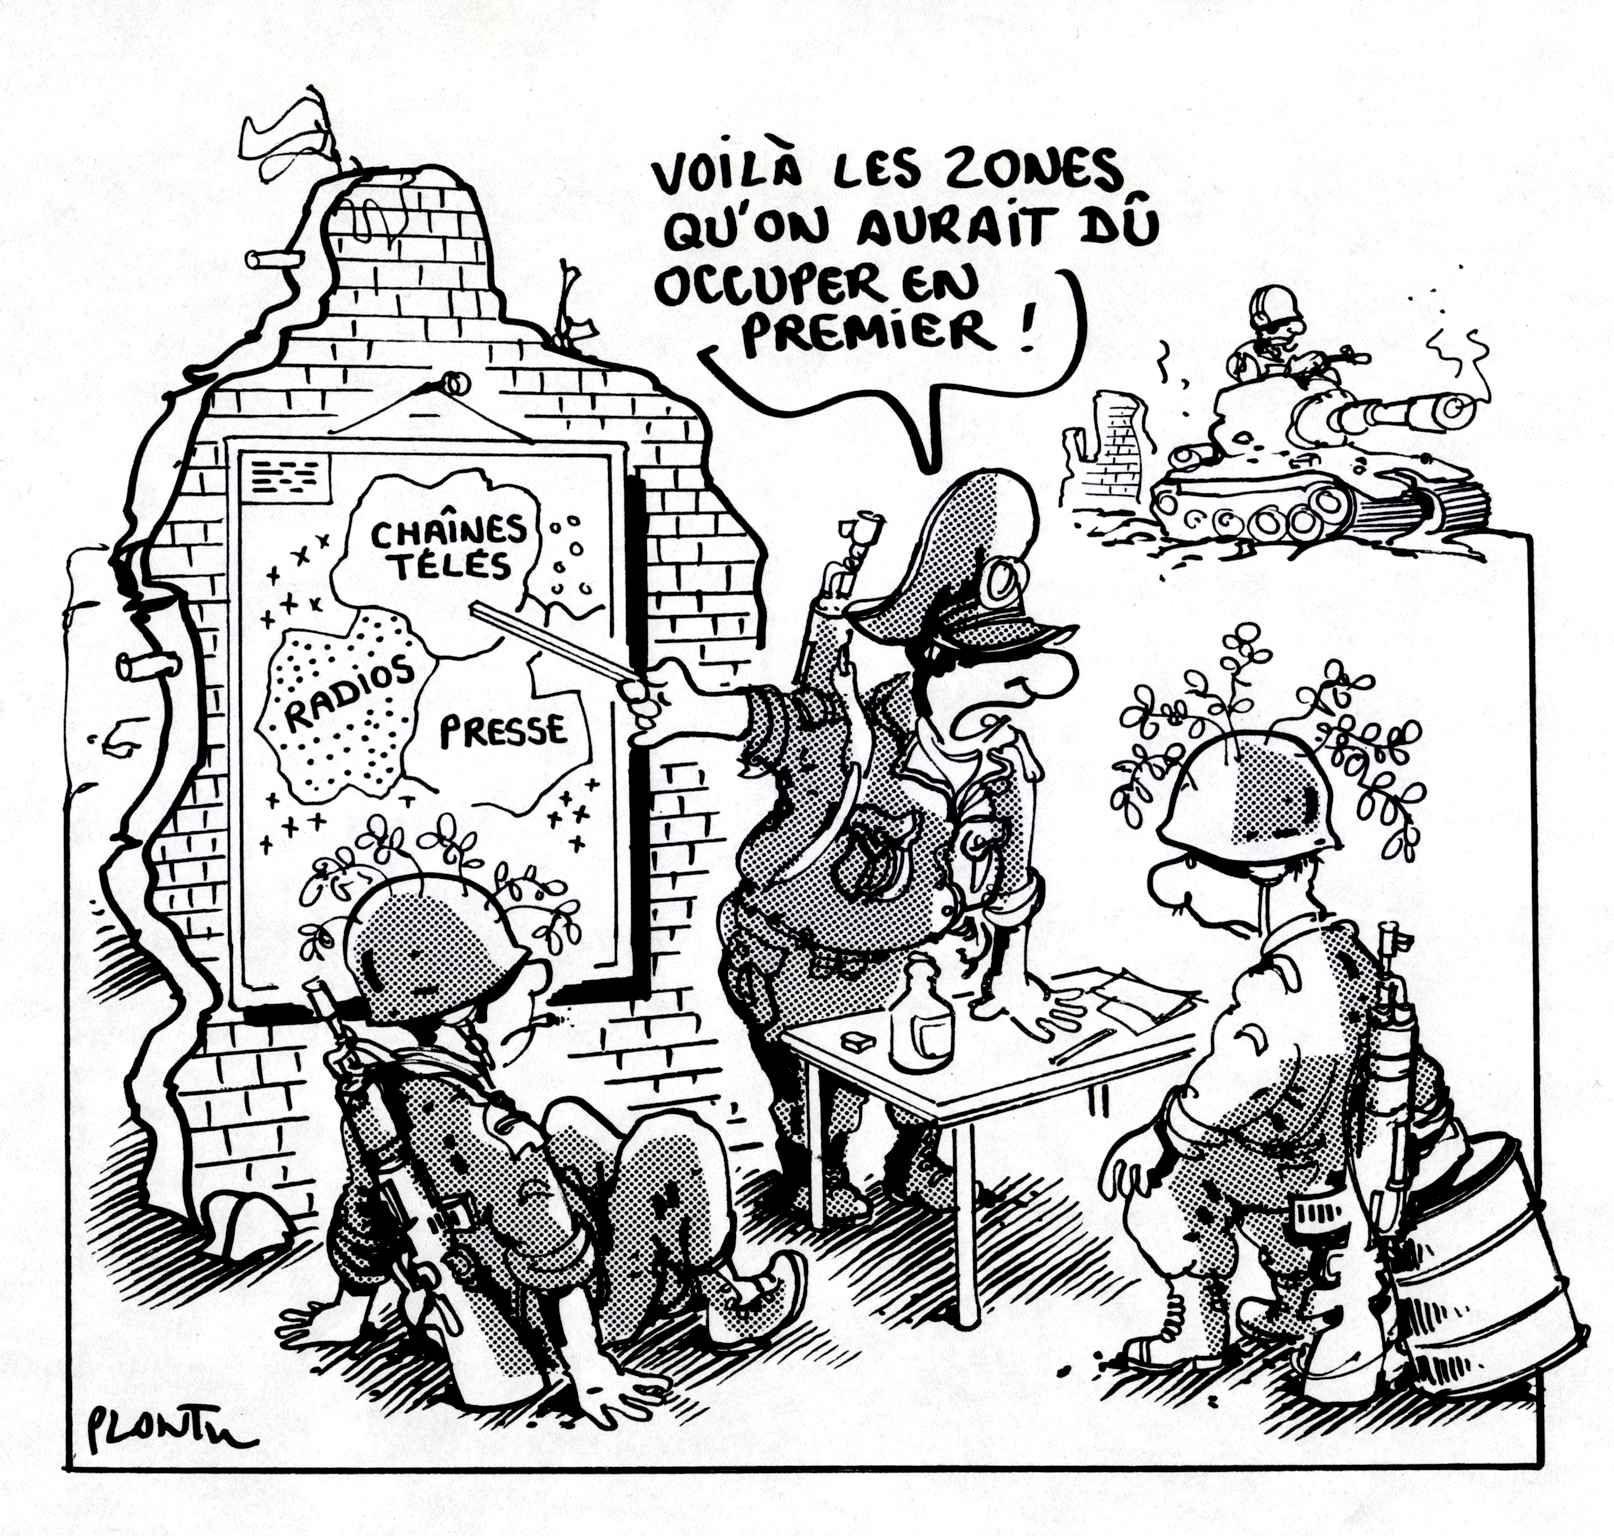 Reporters Sans Frontieres 100 Dessins De Cartooning For Peace Liberte De La Presse Dessin Galeries De Photos